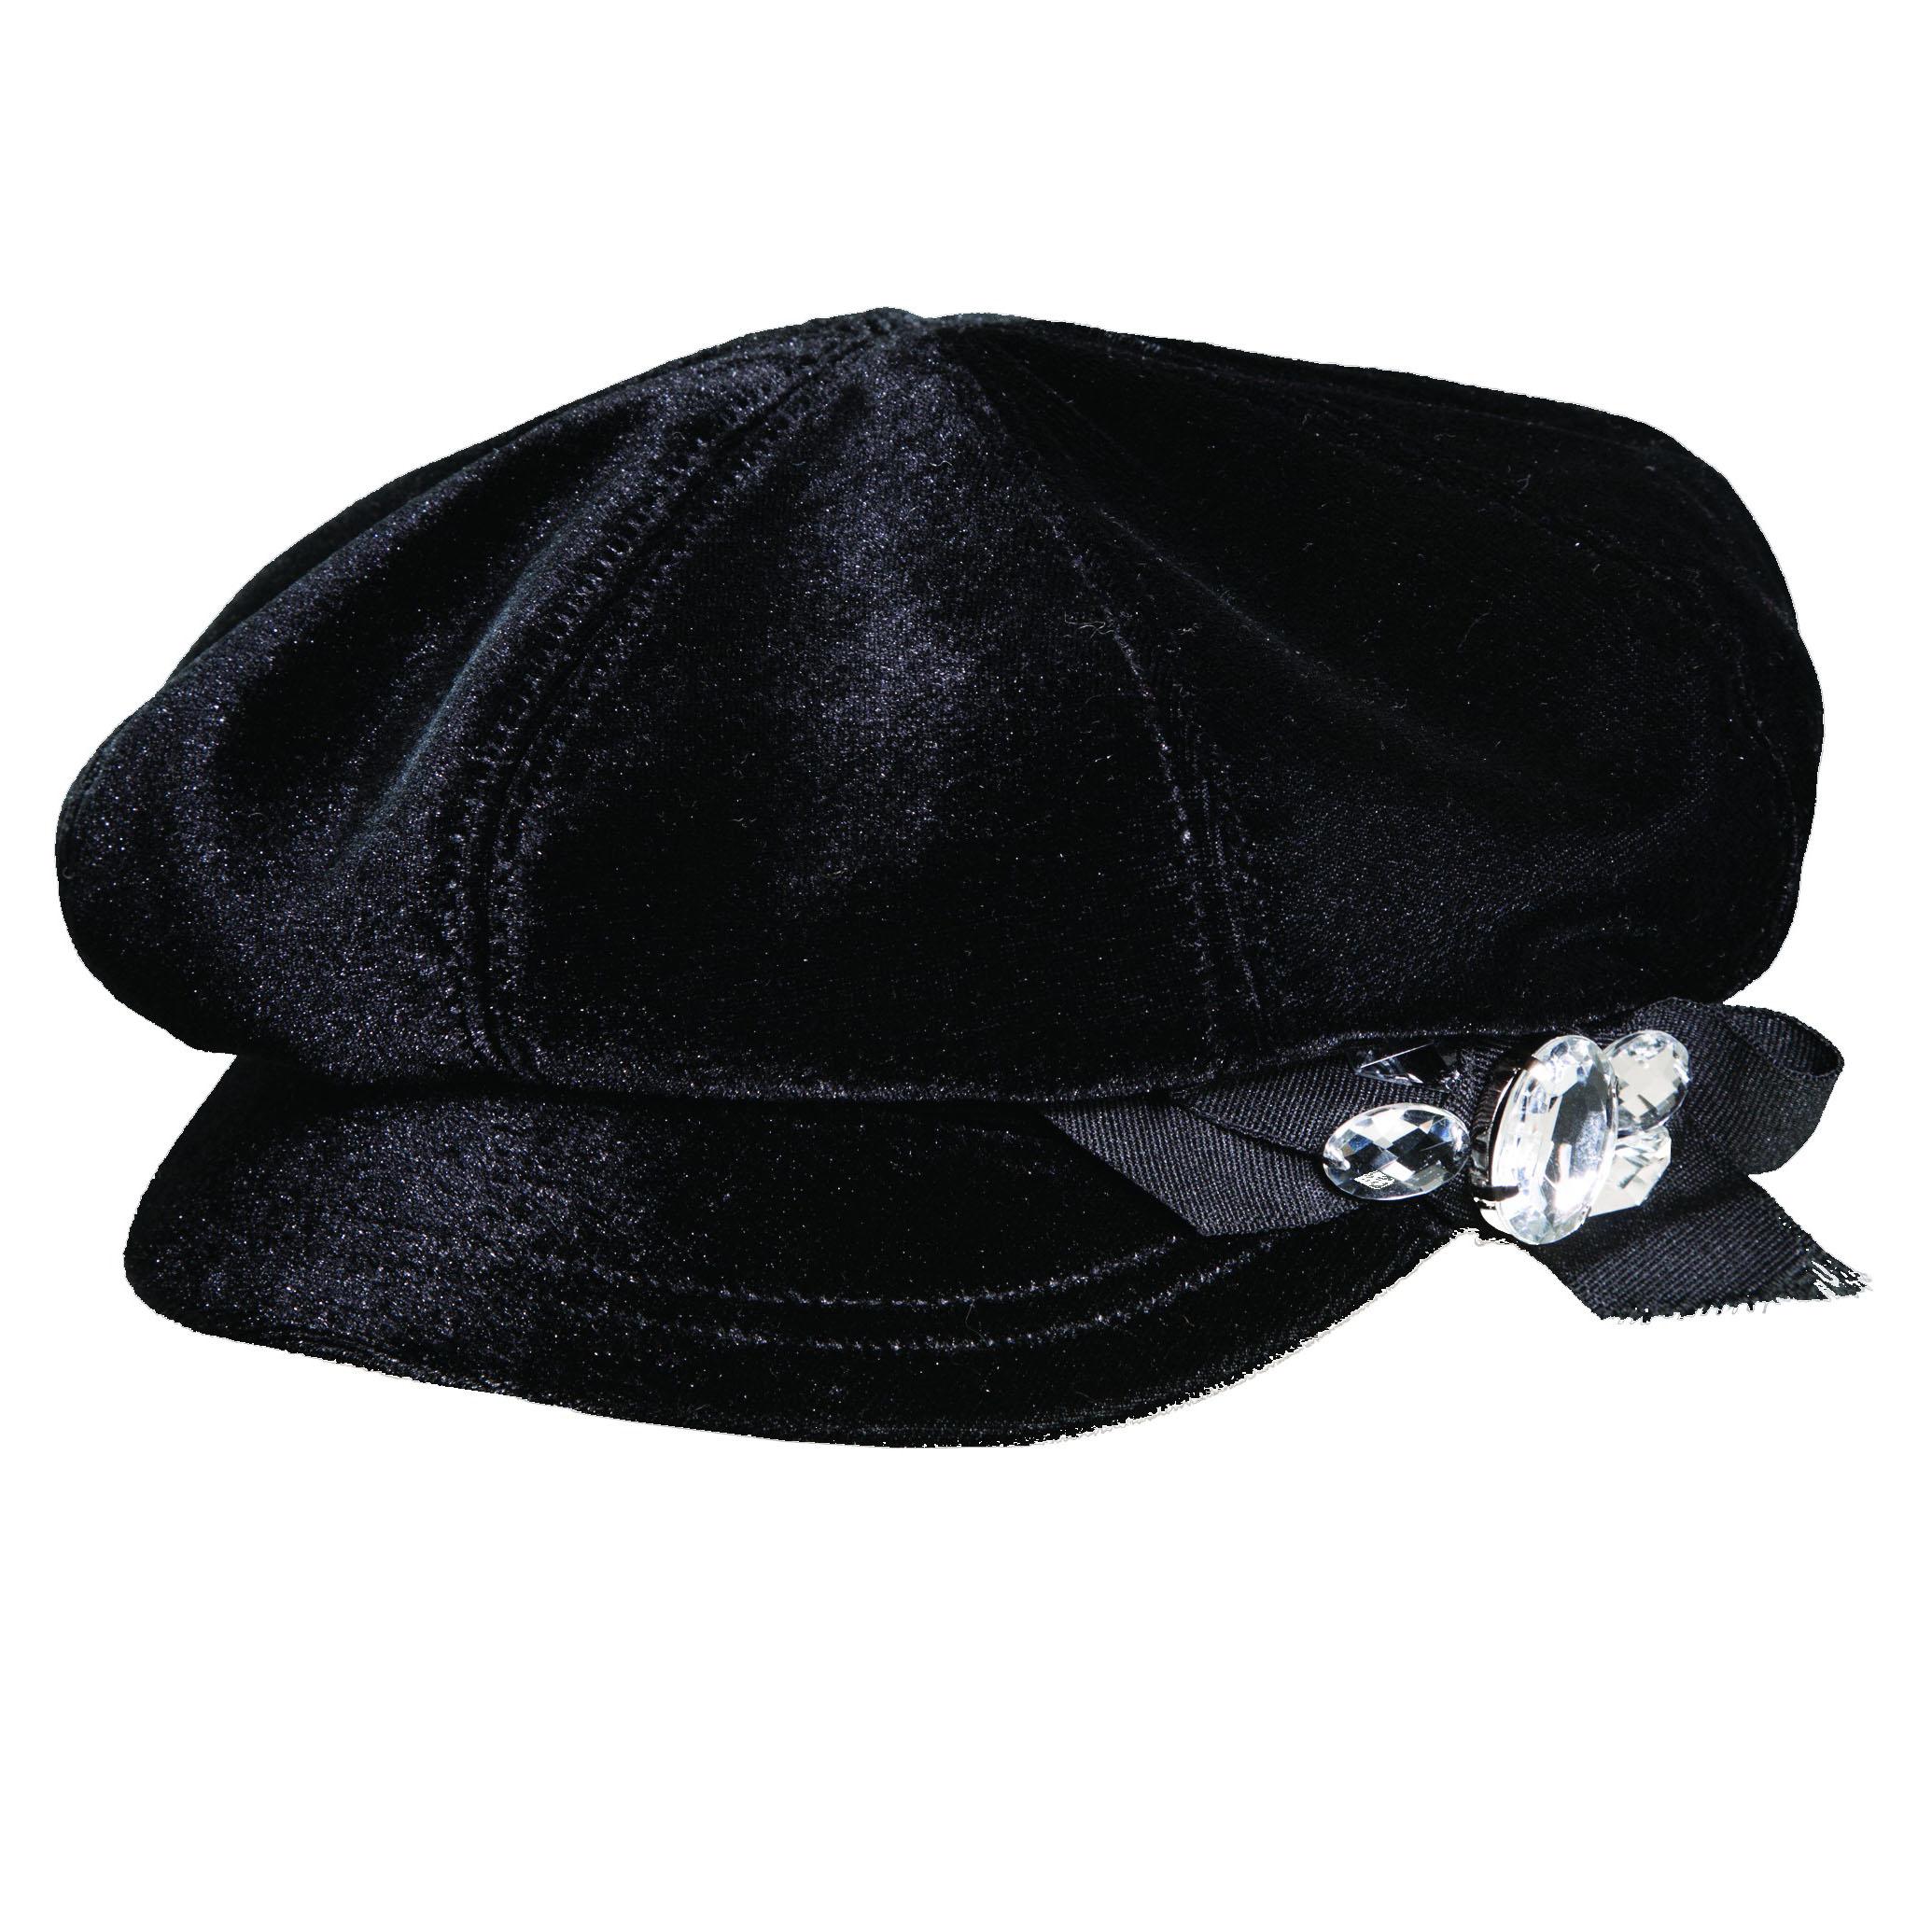 Velvet Newsboy Cap with Rhinestones Black d862b4fde61